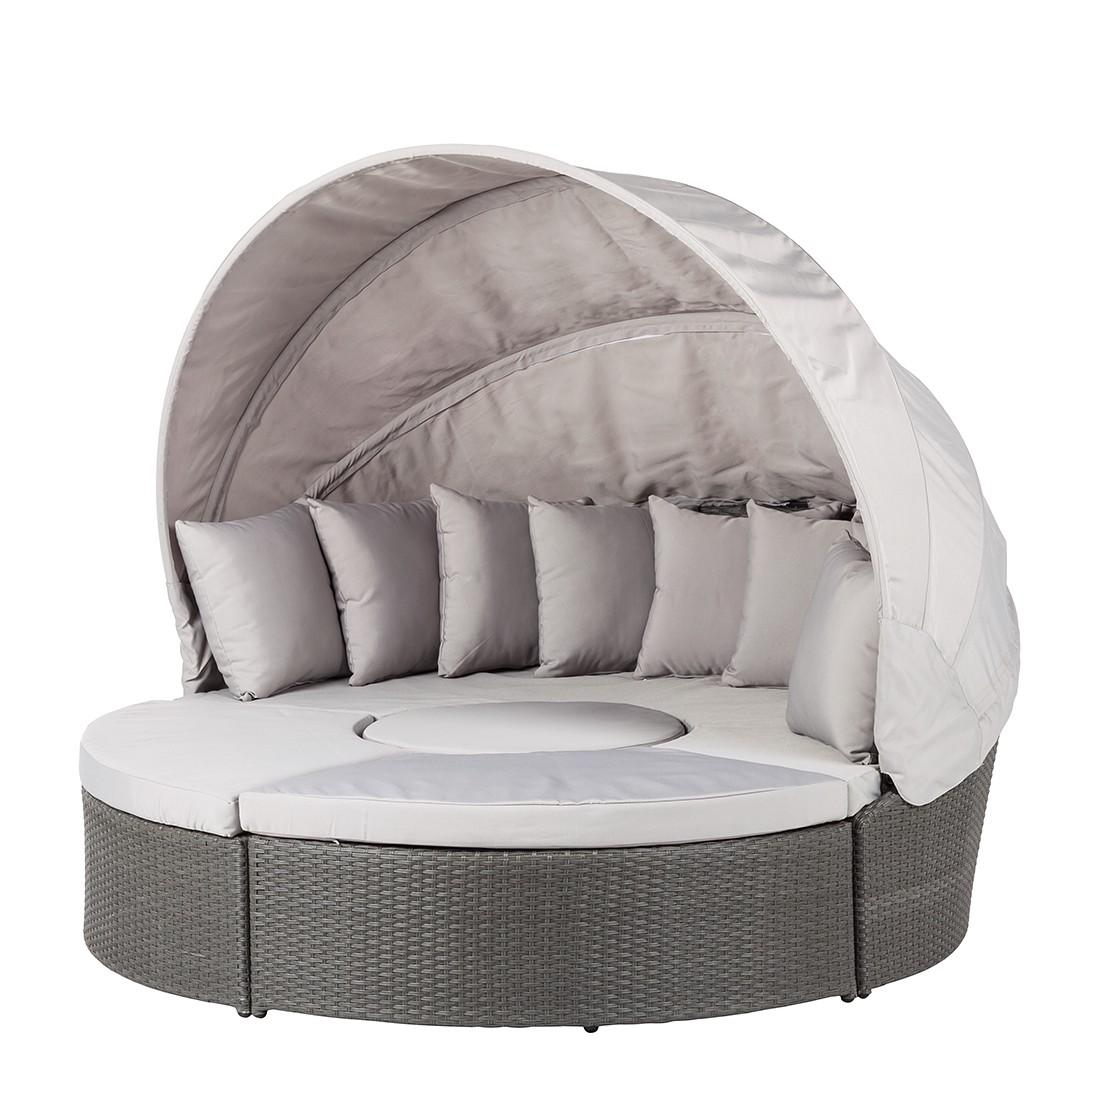 Salon de jardin modulable Premium Paradise Lounge - Polyrotin - Cadre en aluminium - Gris / Gris cla